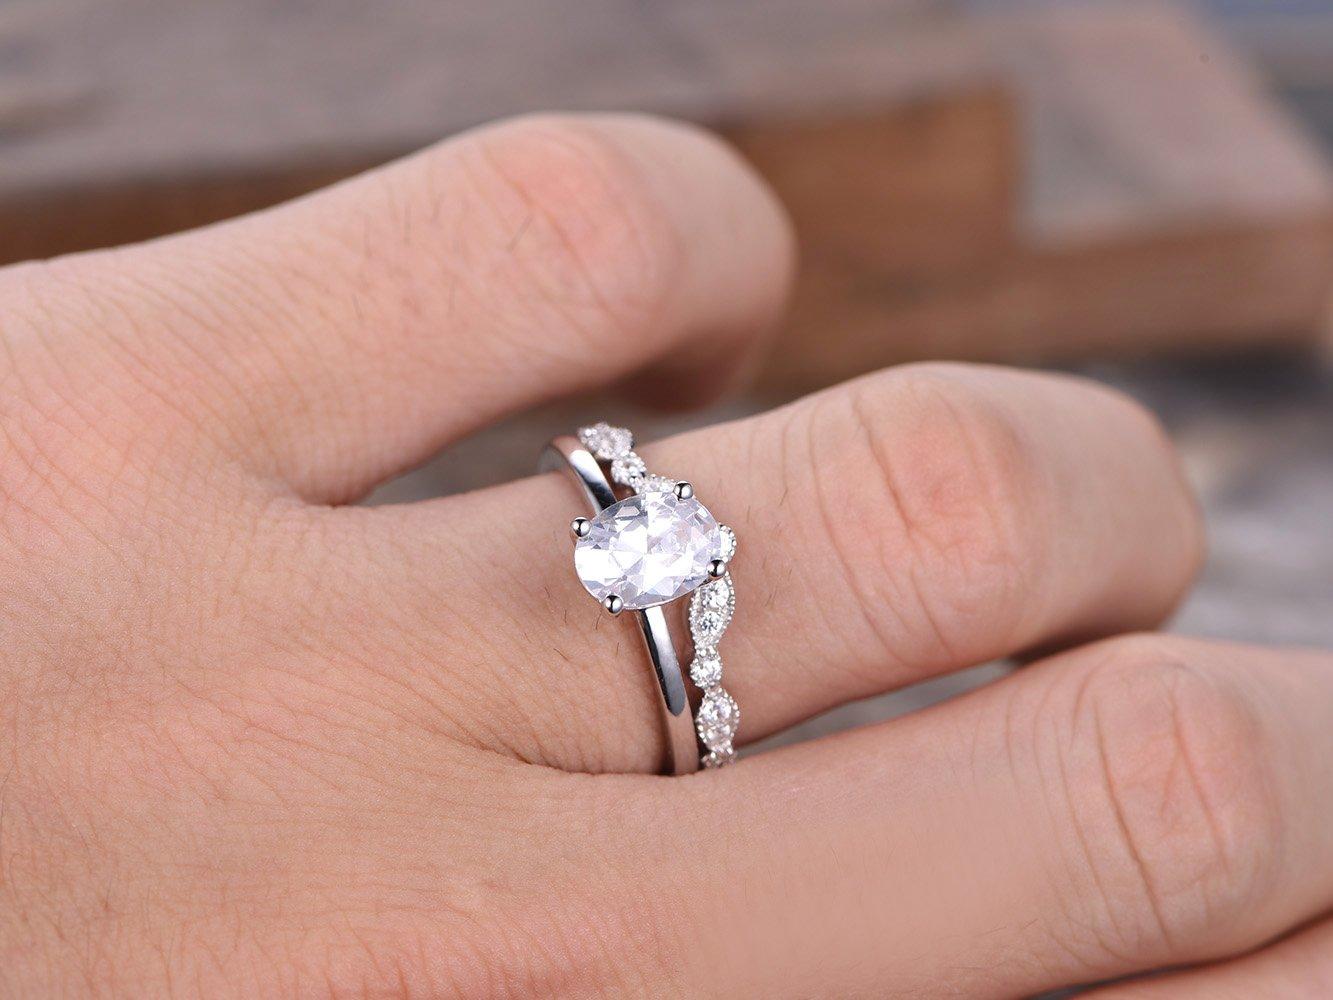 Amazon.com: CZ Diamond Wedding Ring Set,6x8mm Oval Cut Solitaire ...